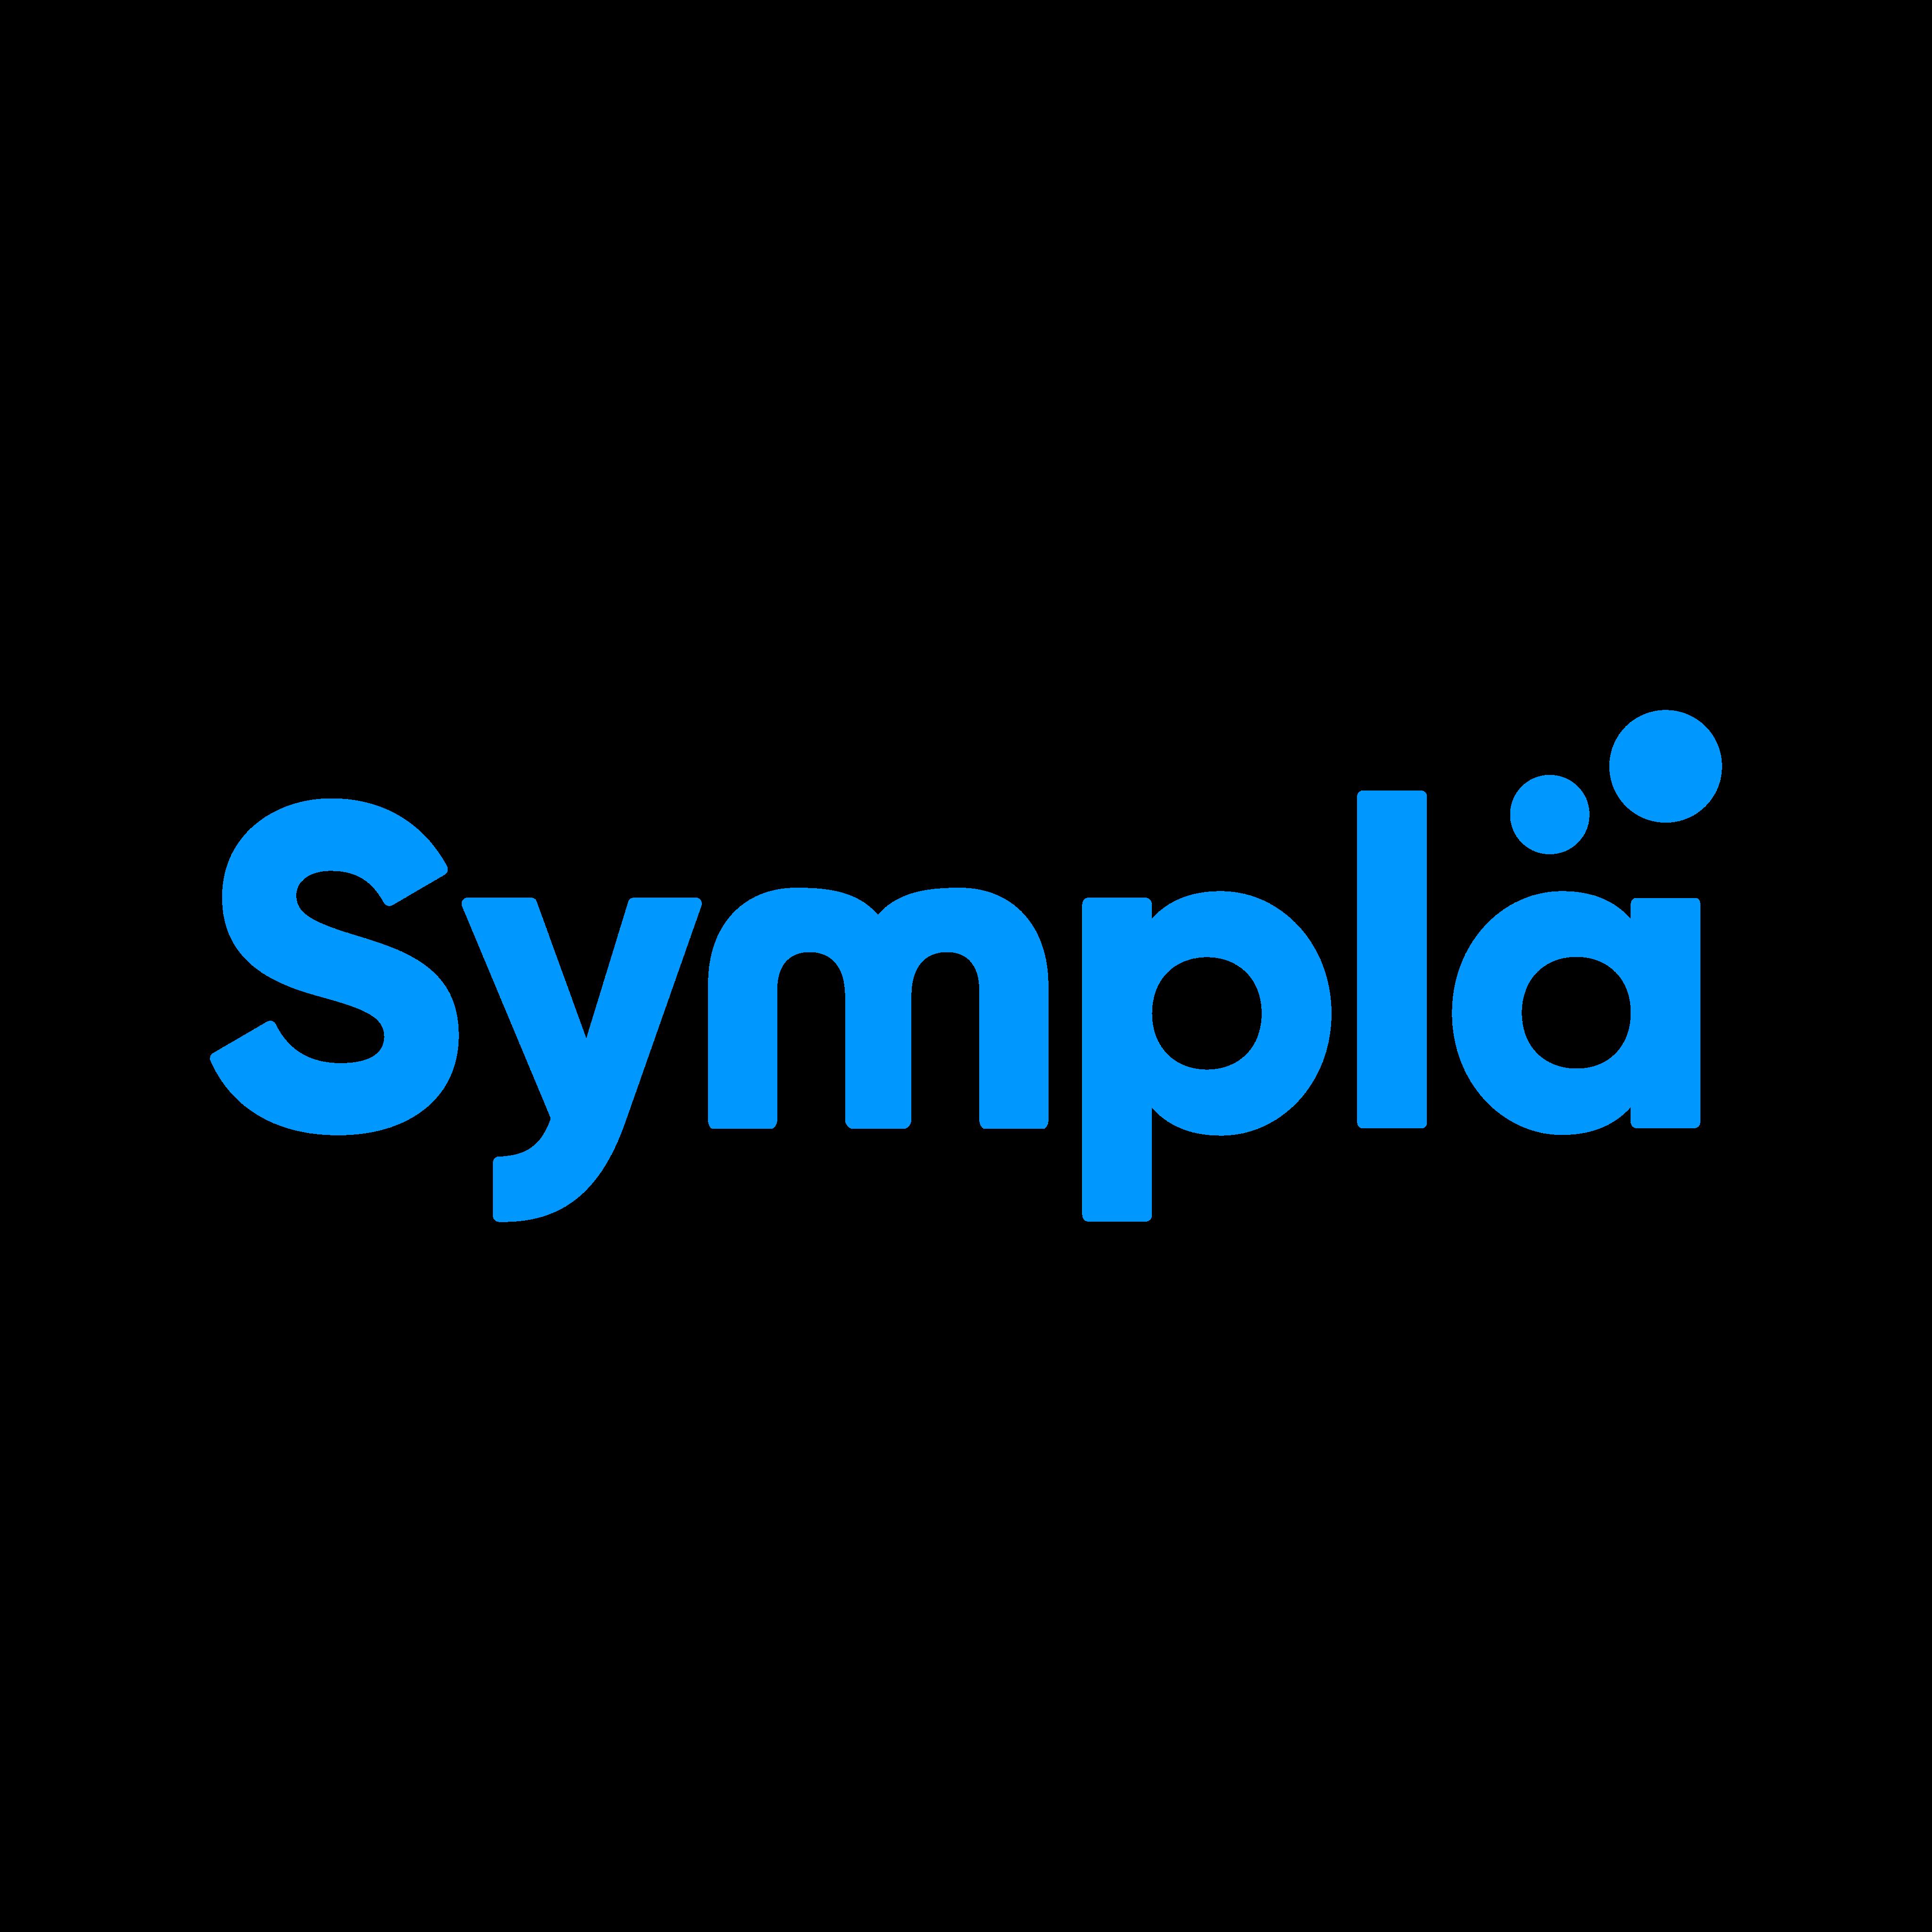 sympla logo 0 - Sympla Logo